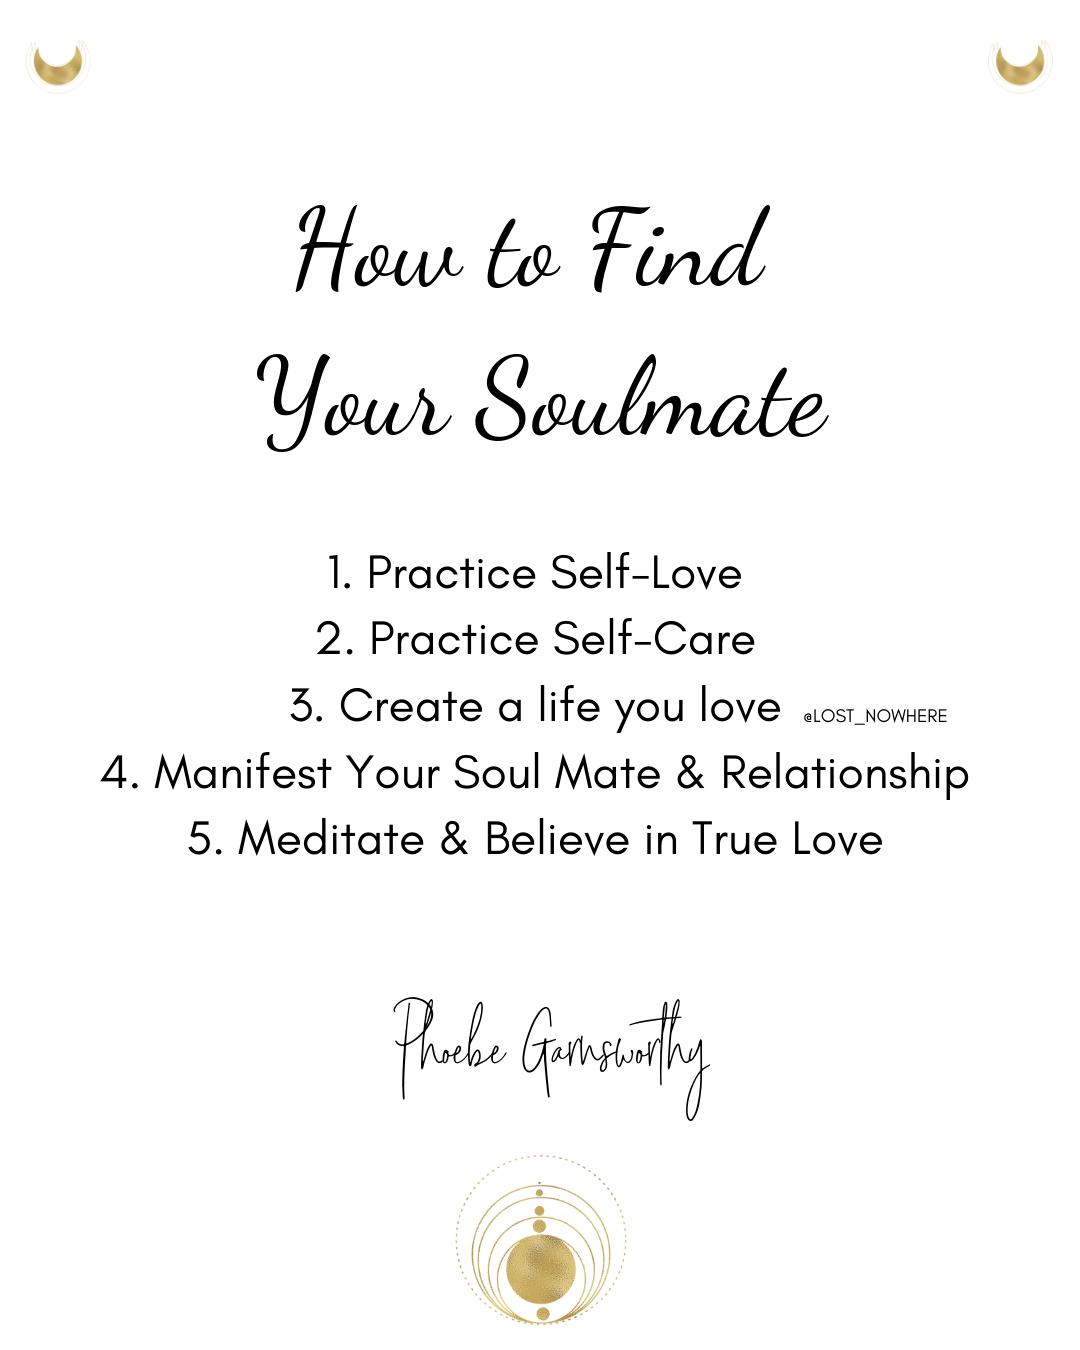 d692a8013e187bcd603a1ca2d9e0166e - How To Get In Touch With My Spiritual Self